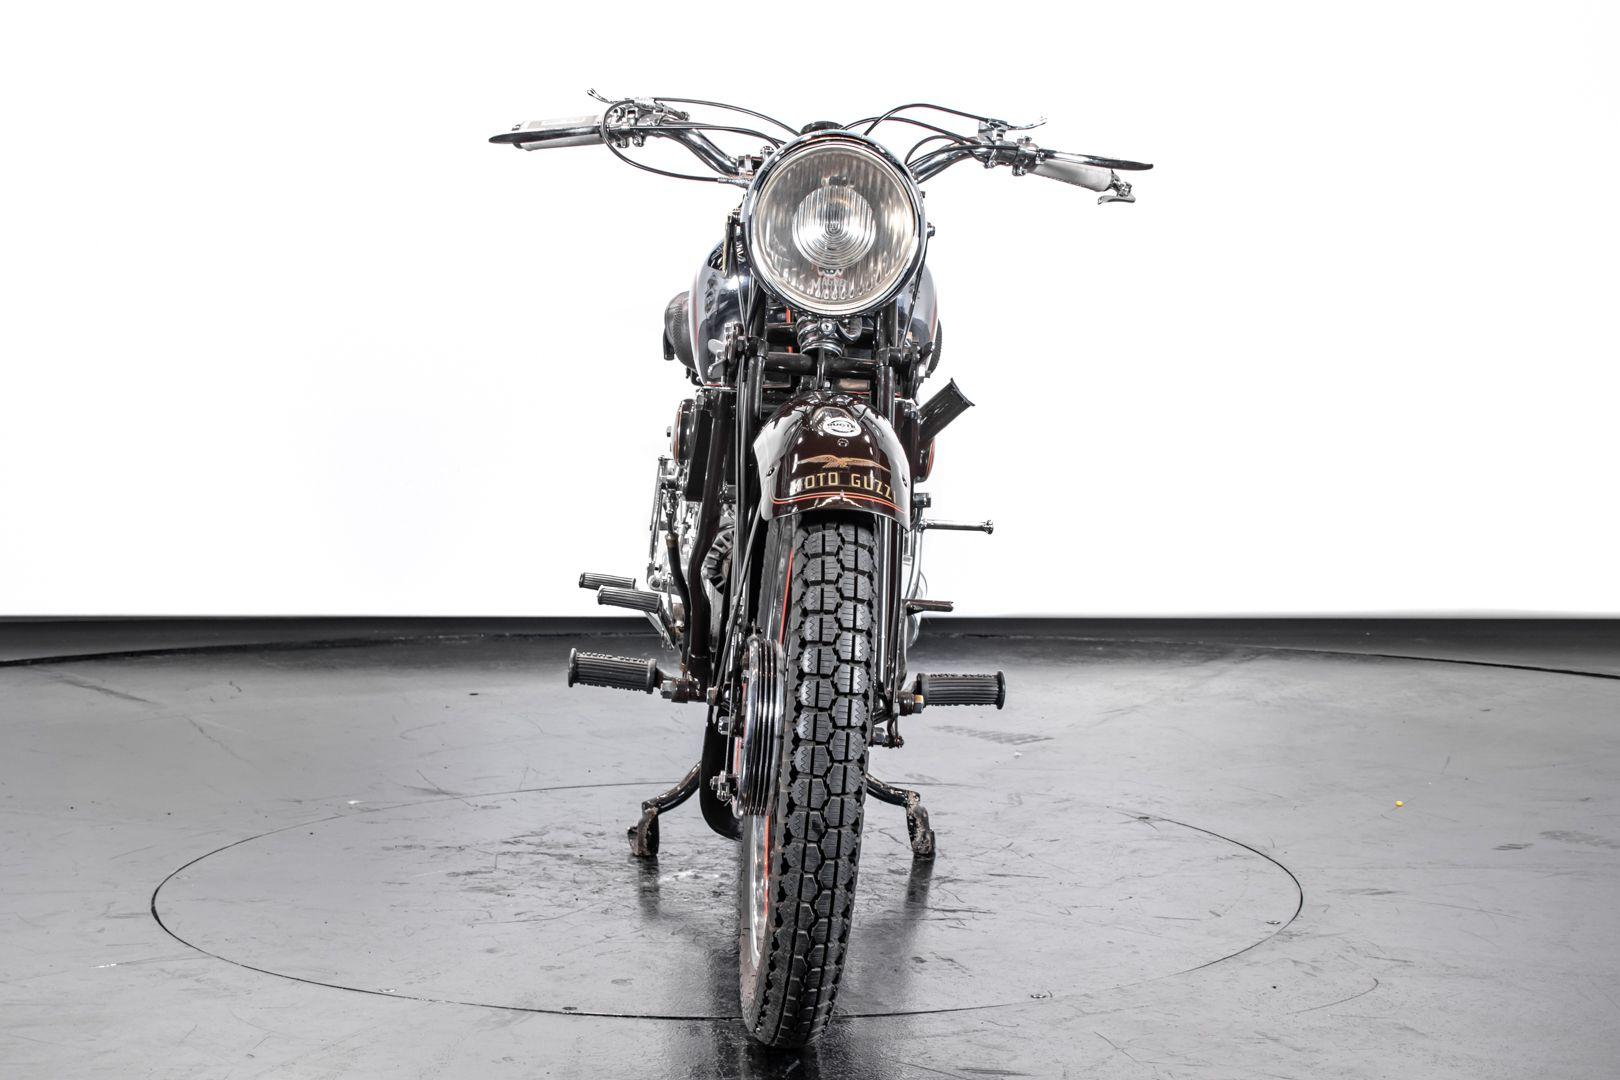 1951 Moto Guzzi 500 72170